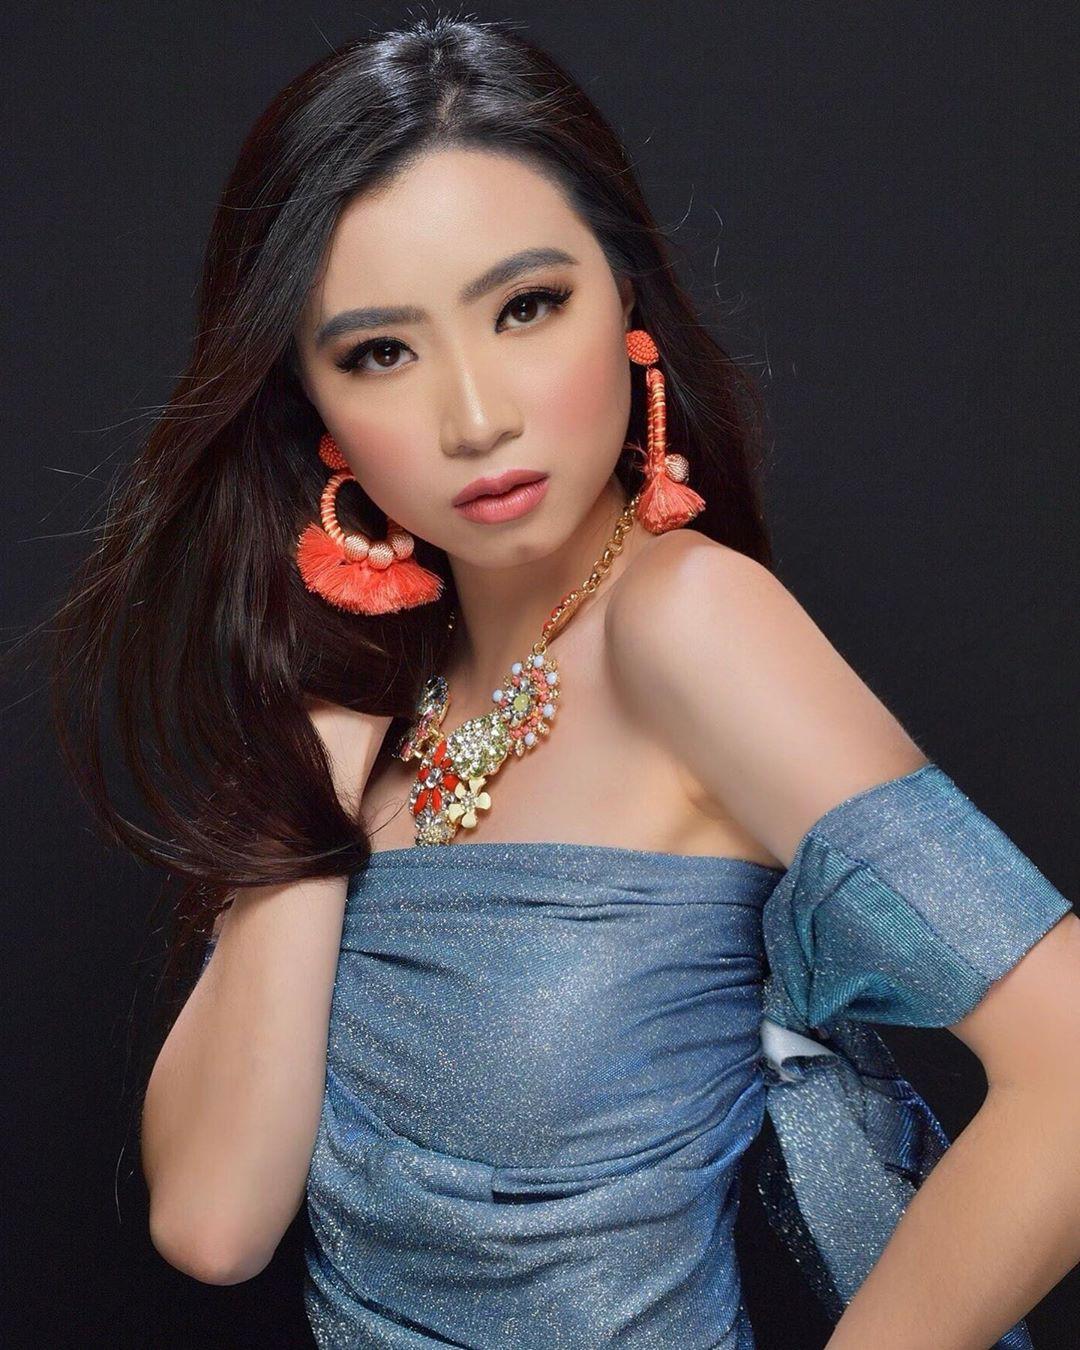 Elizabeth Nguyen photoshoot ideas, beautiful girls pictures, Black Natural Hair